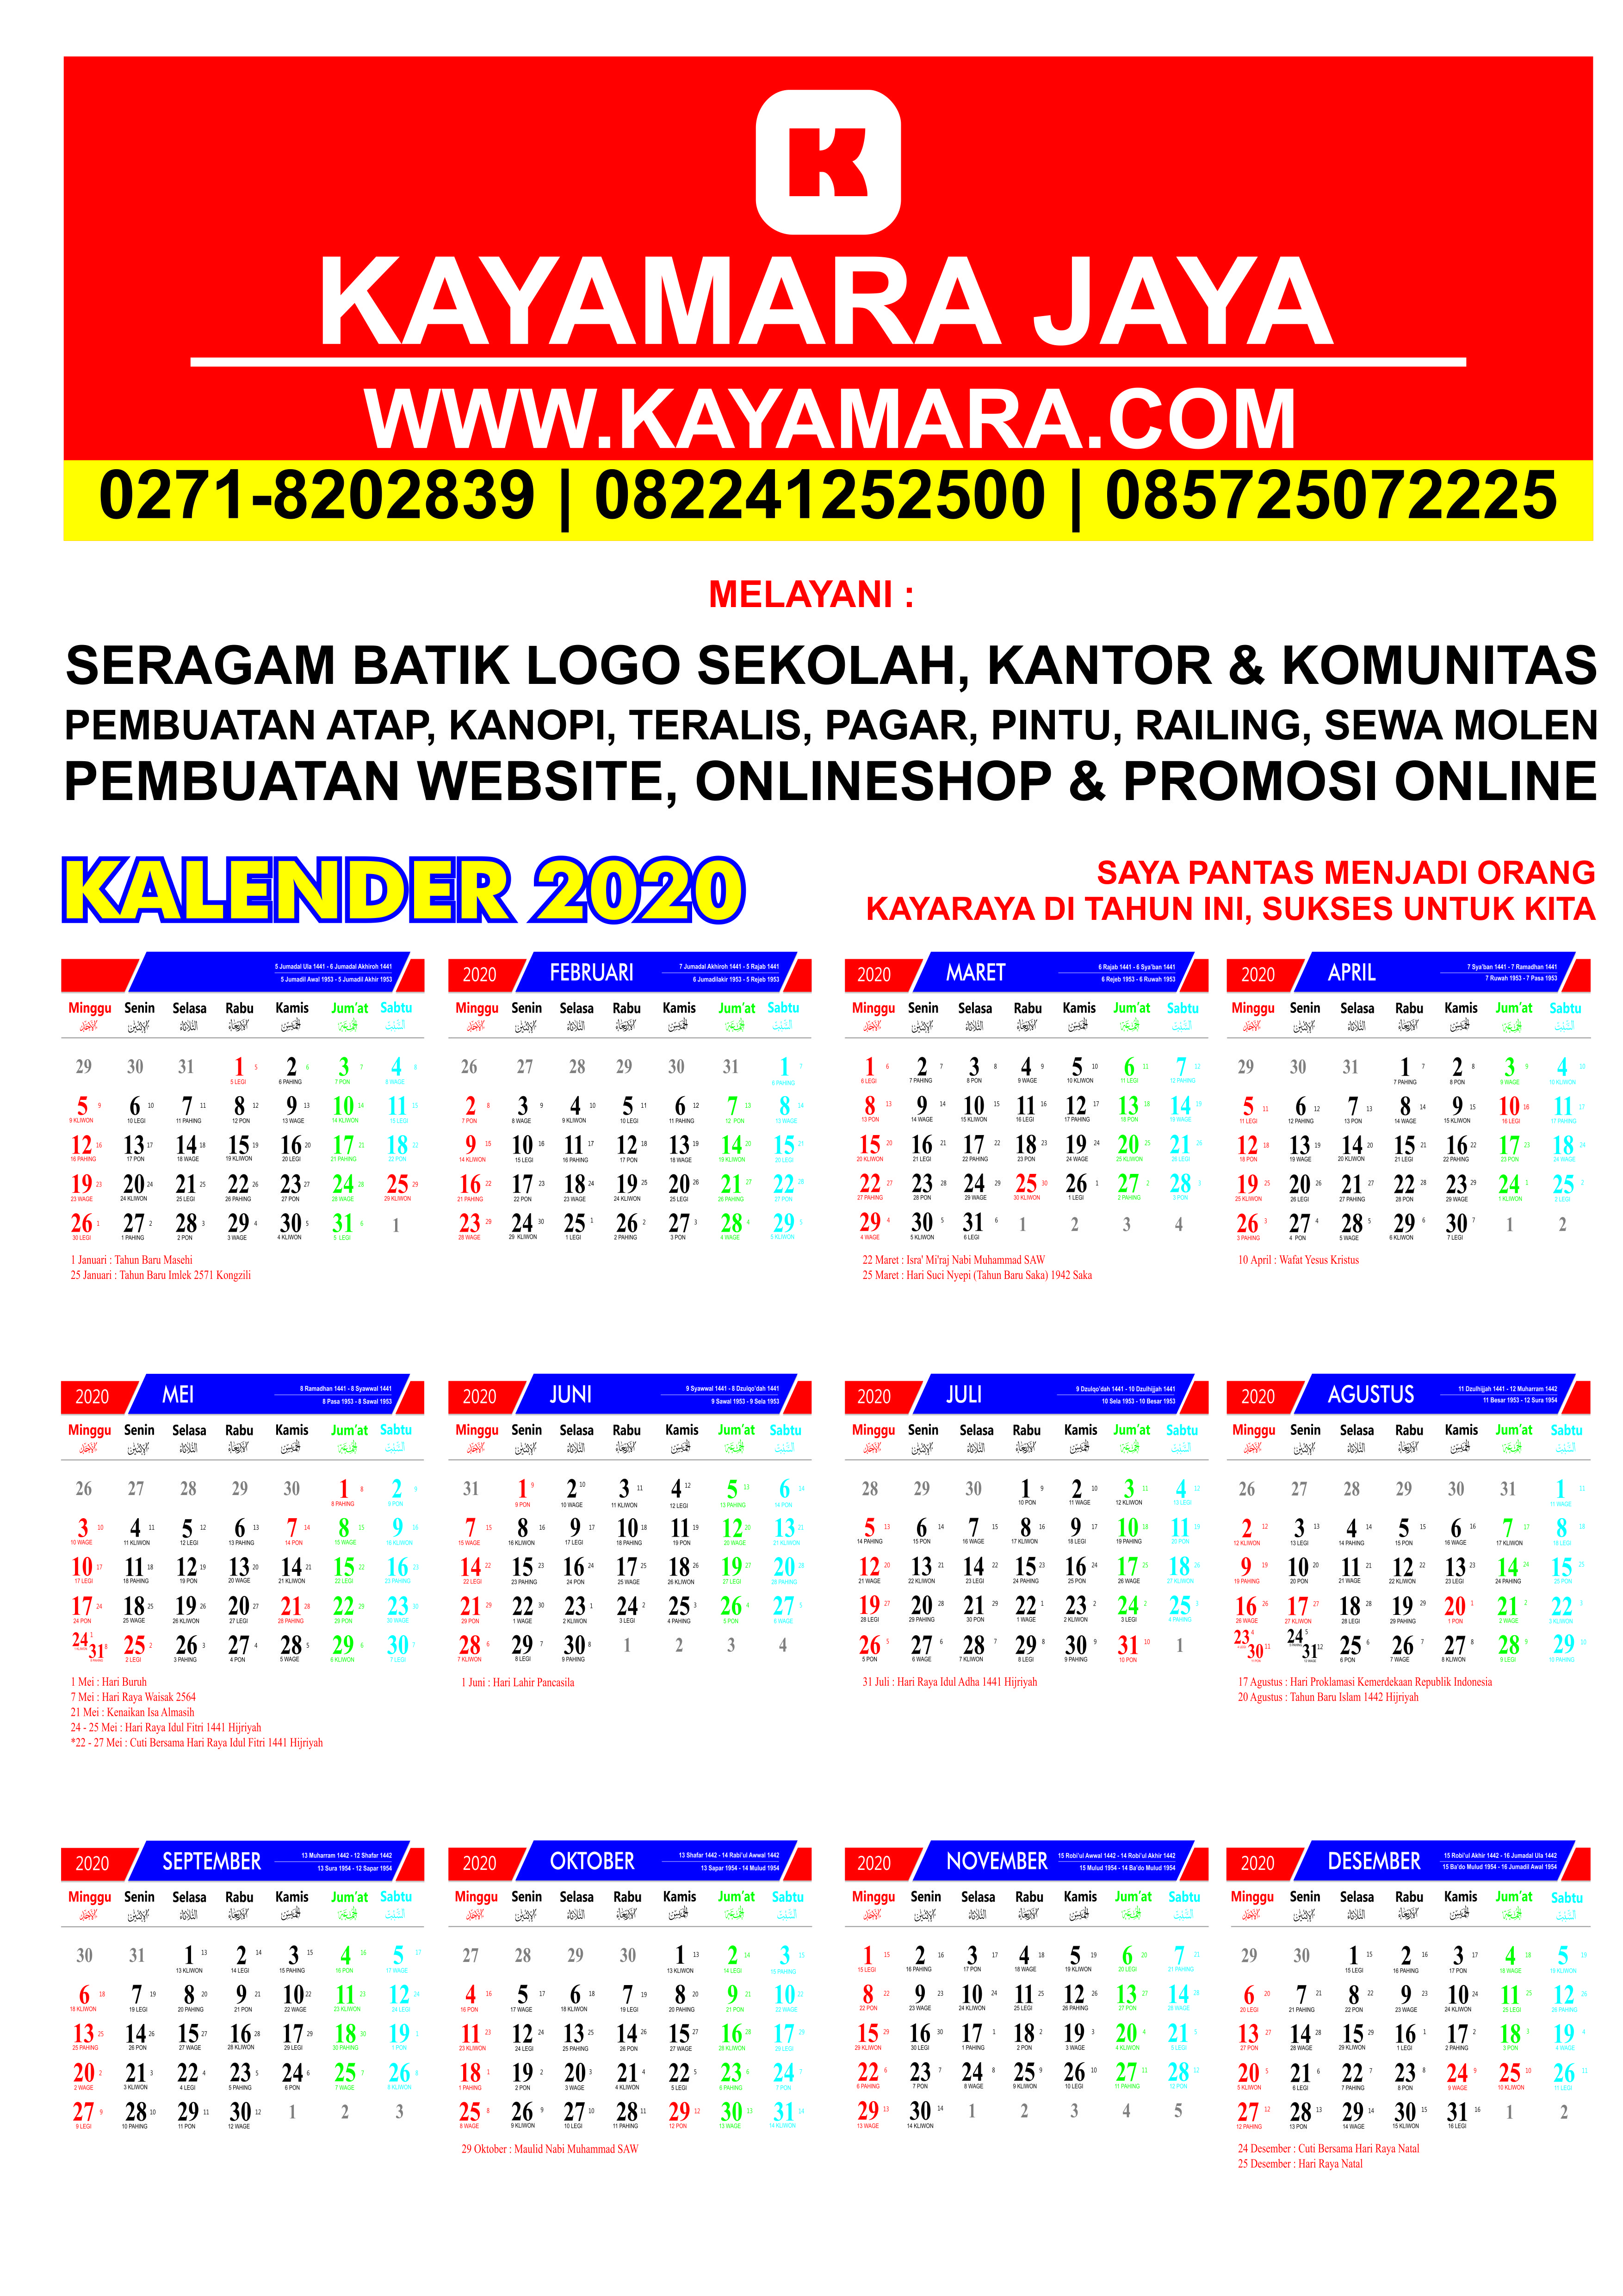 Kalender 2020 CorelDraw X2 kayamara